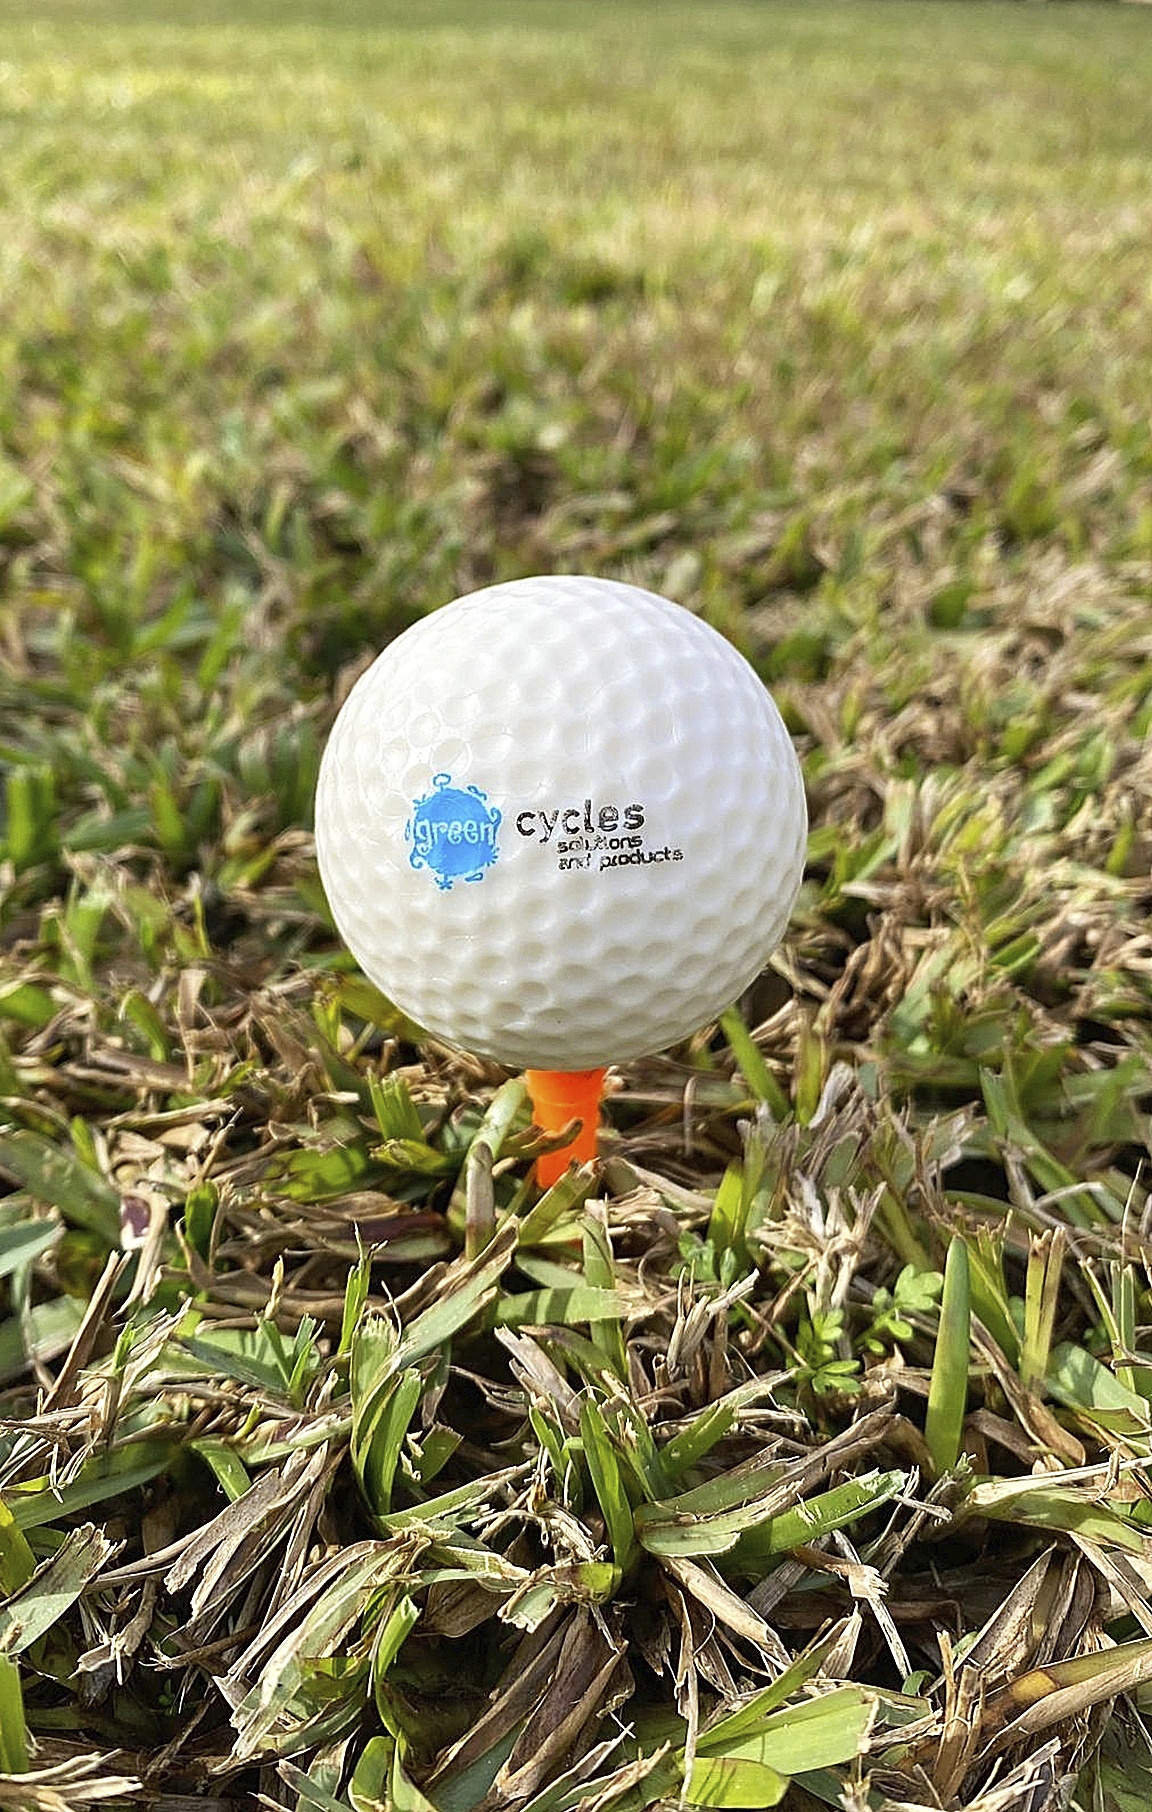 Green Cycles ha creado pelotas de golf hidrosolubles y biodegradables